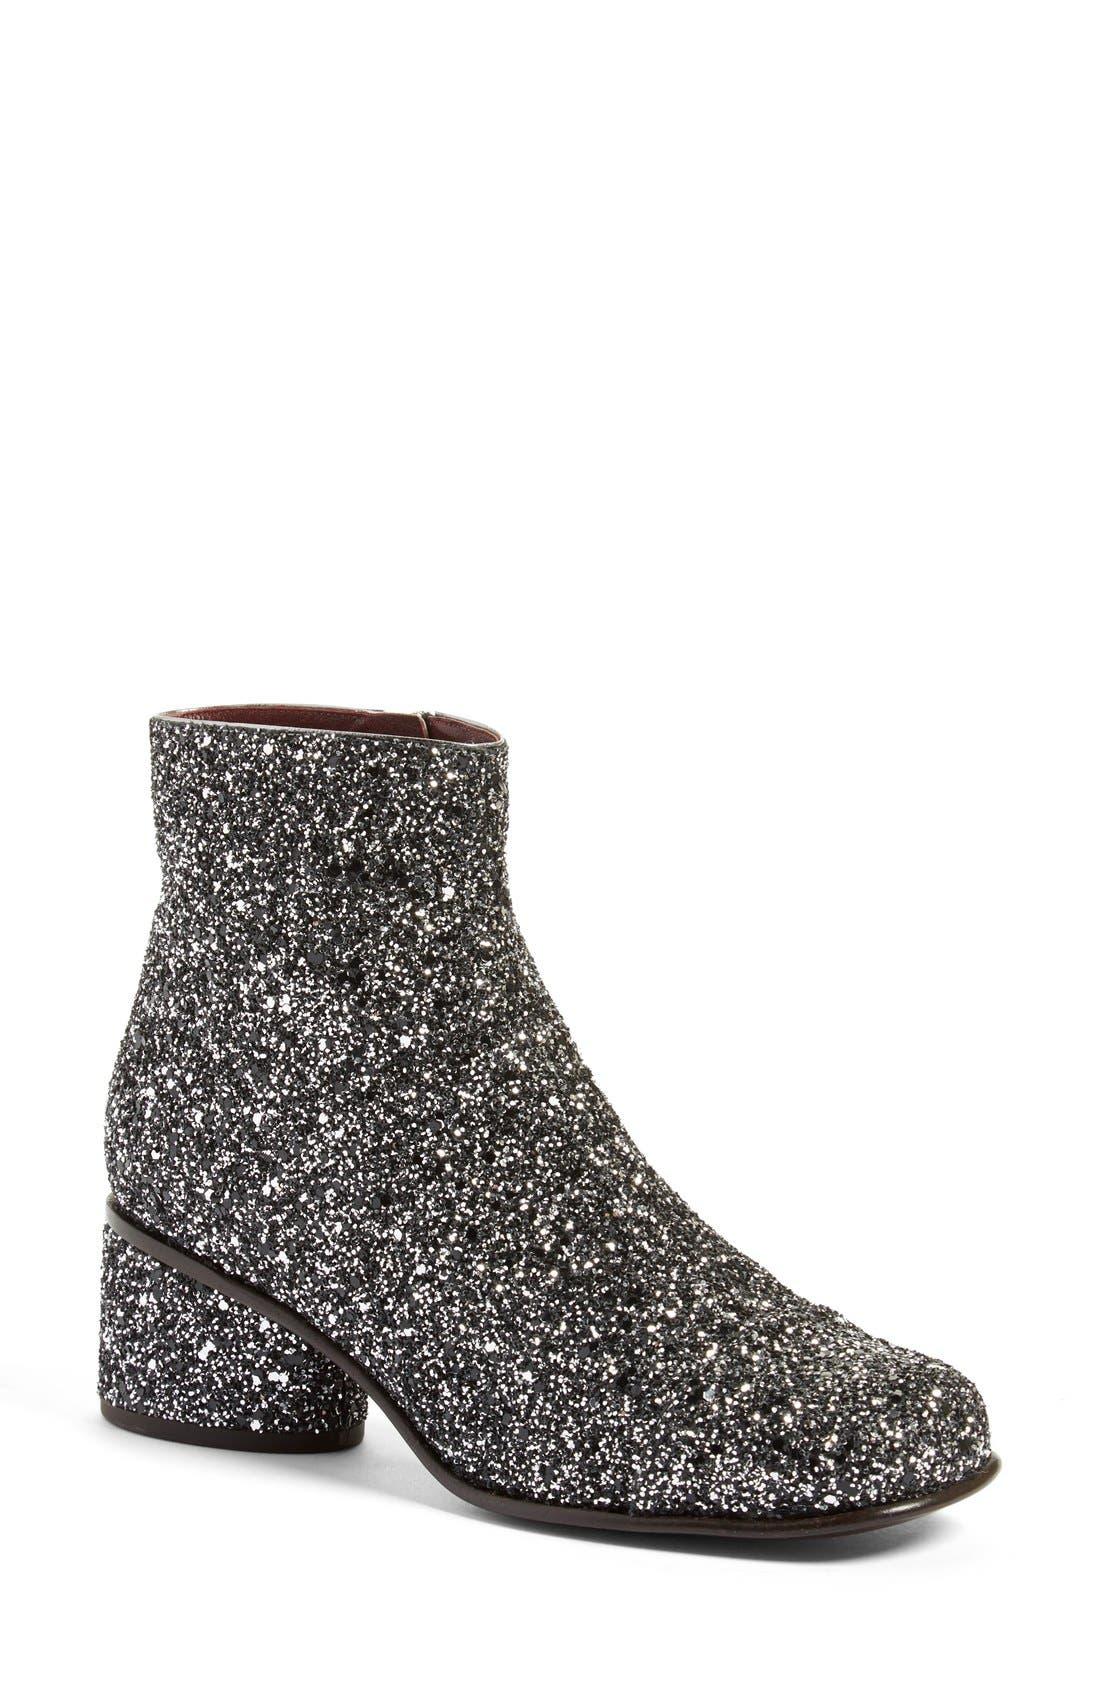 'Camilla' Ankle Boot,                             Main thumbnail 1, color,                             040